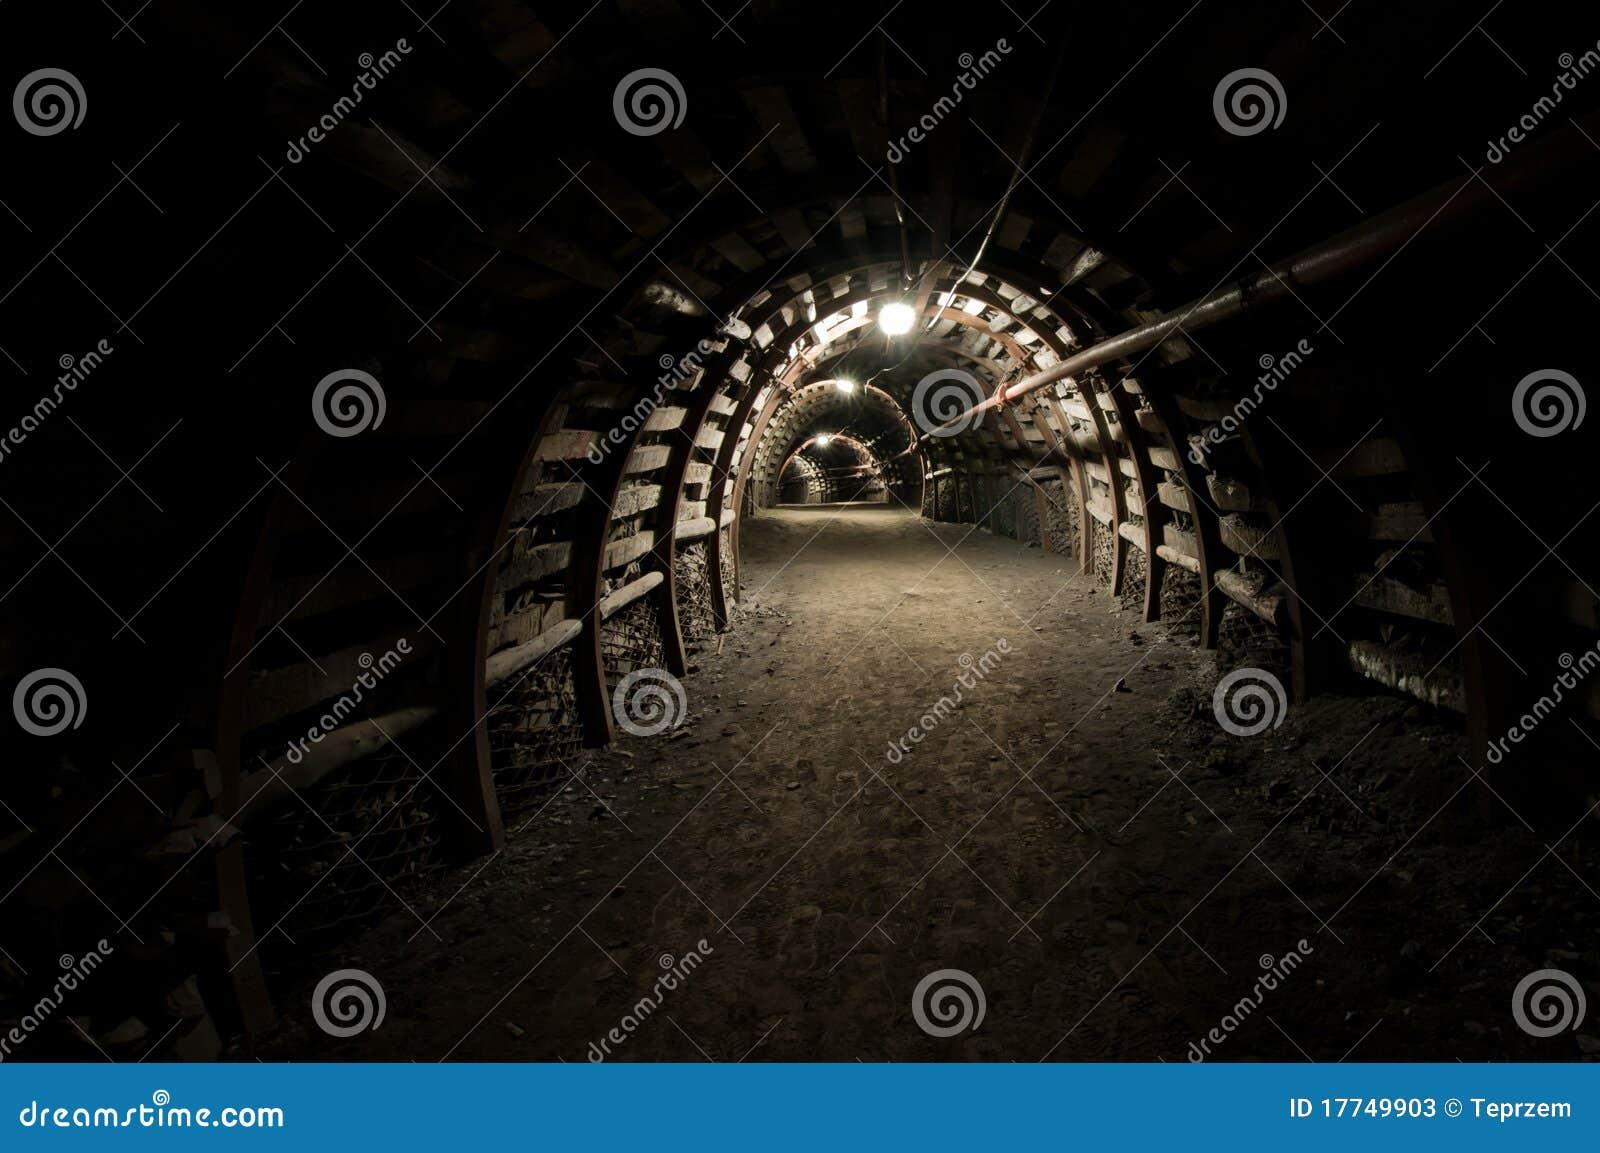 Modern Coal Mine Stock Photos - Image: 17749903